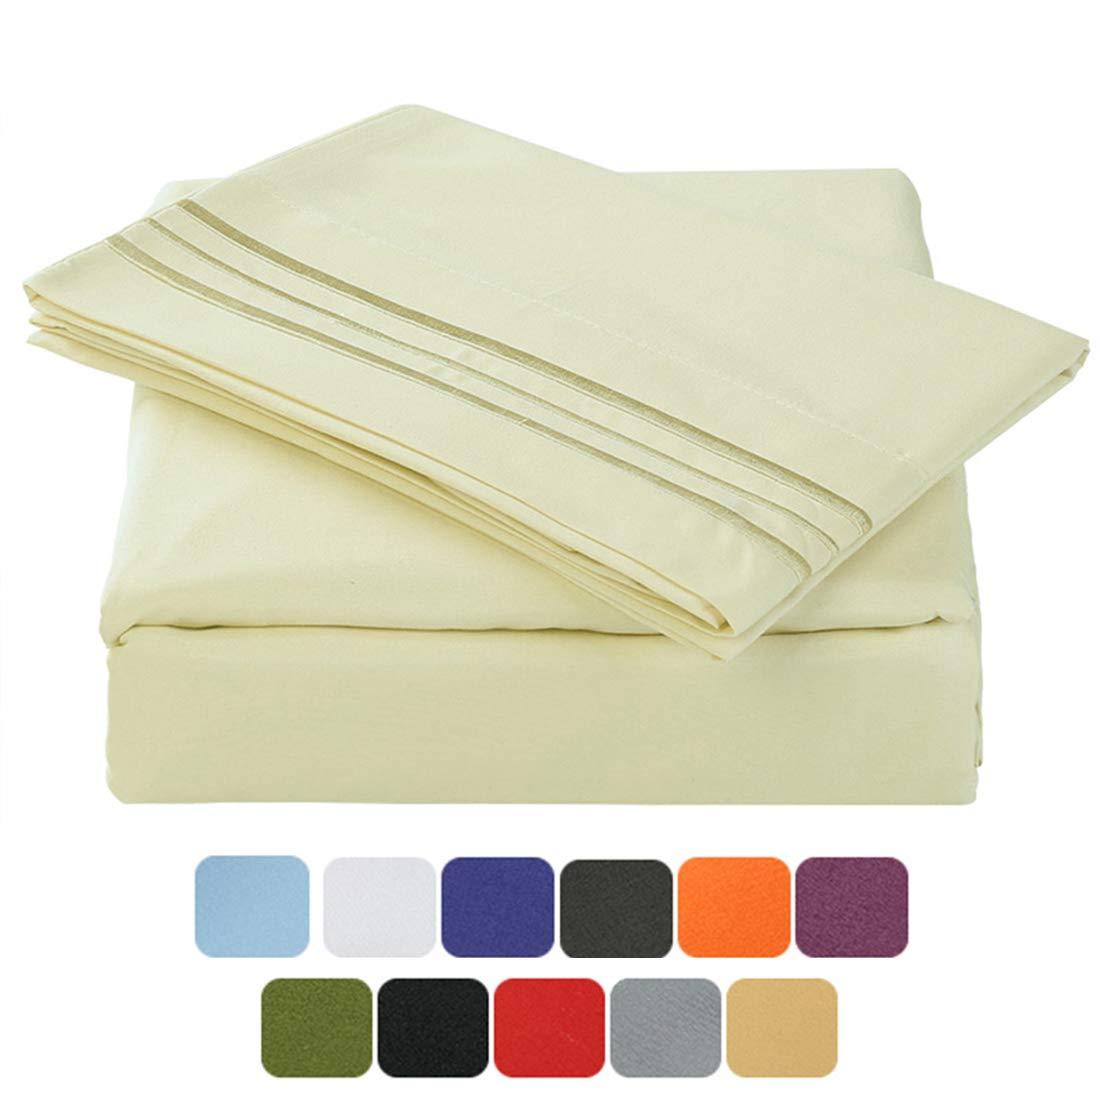 TASTELIFE 105 GSM Deep Pocket Bed Sheet Set Brushed Hypoallergenic Microfiber 1800 Bedding Sheets Wrinkle, Fade, Stain Resistant - 4 Piece(Ivory,California King)